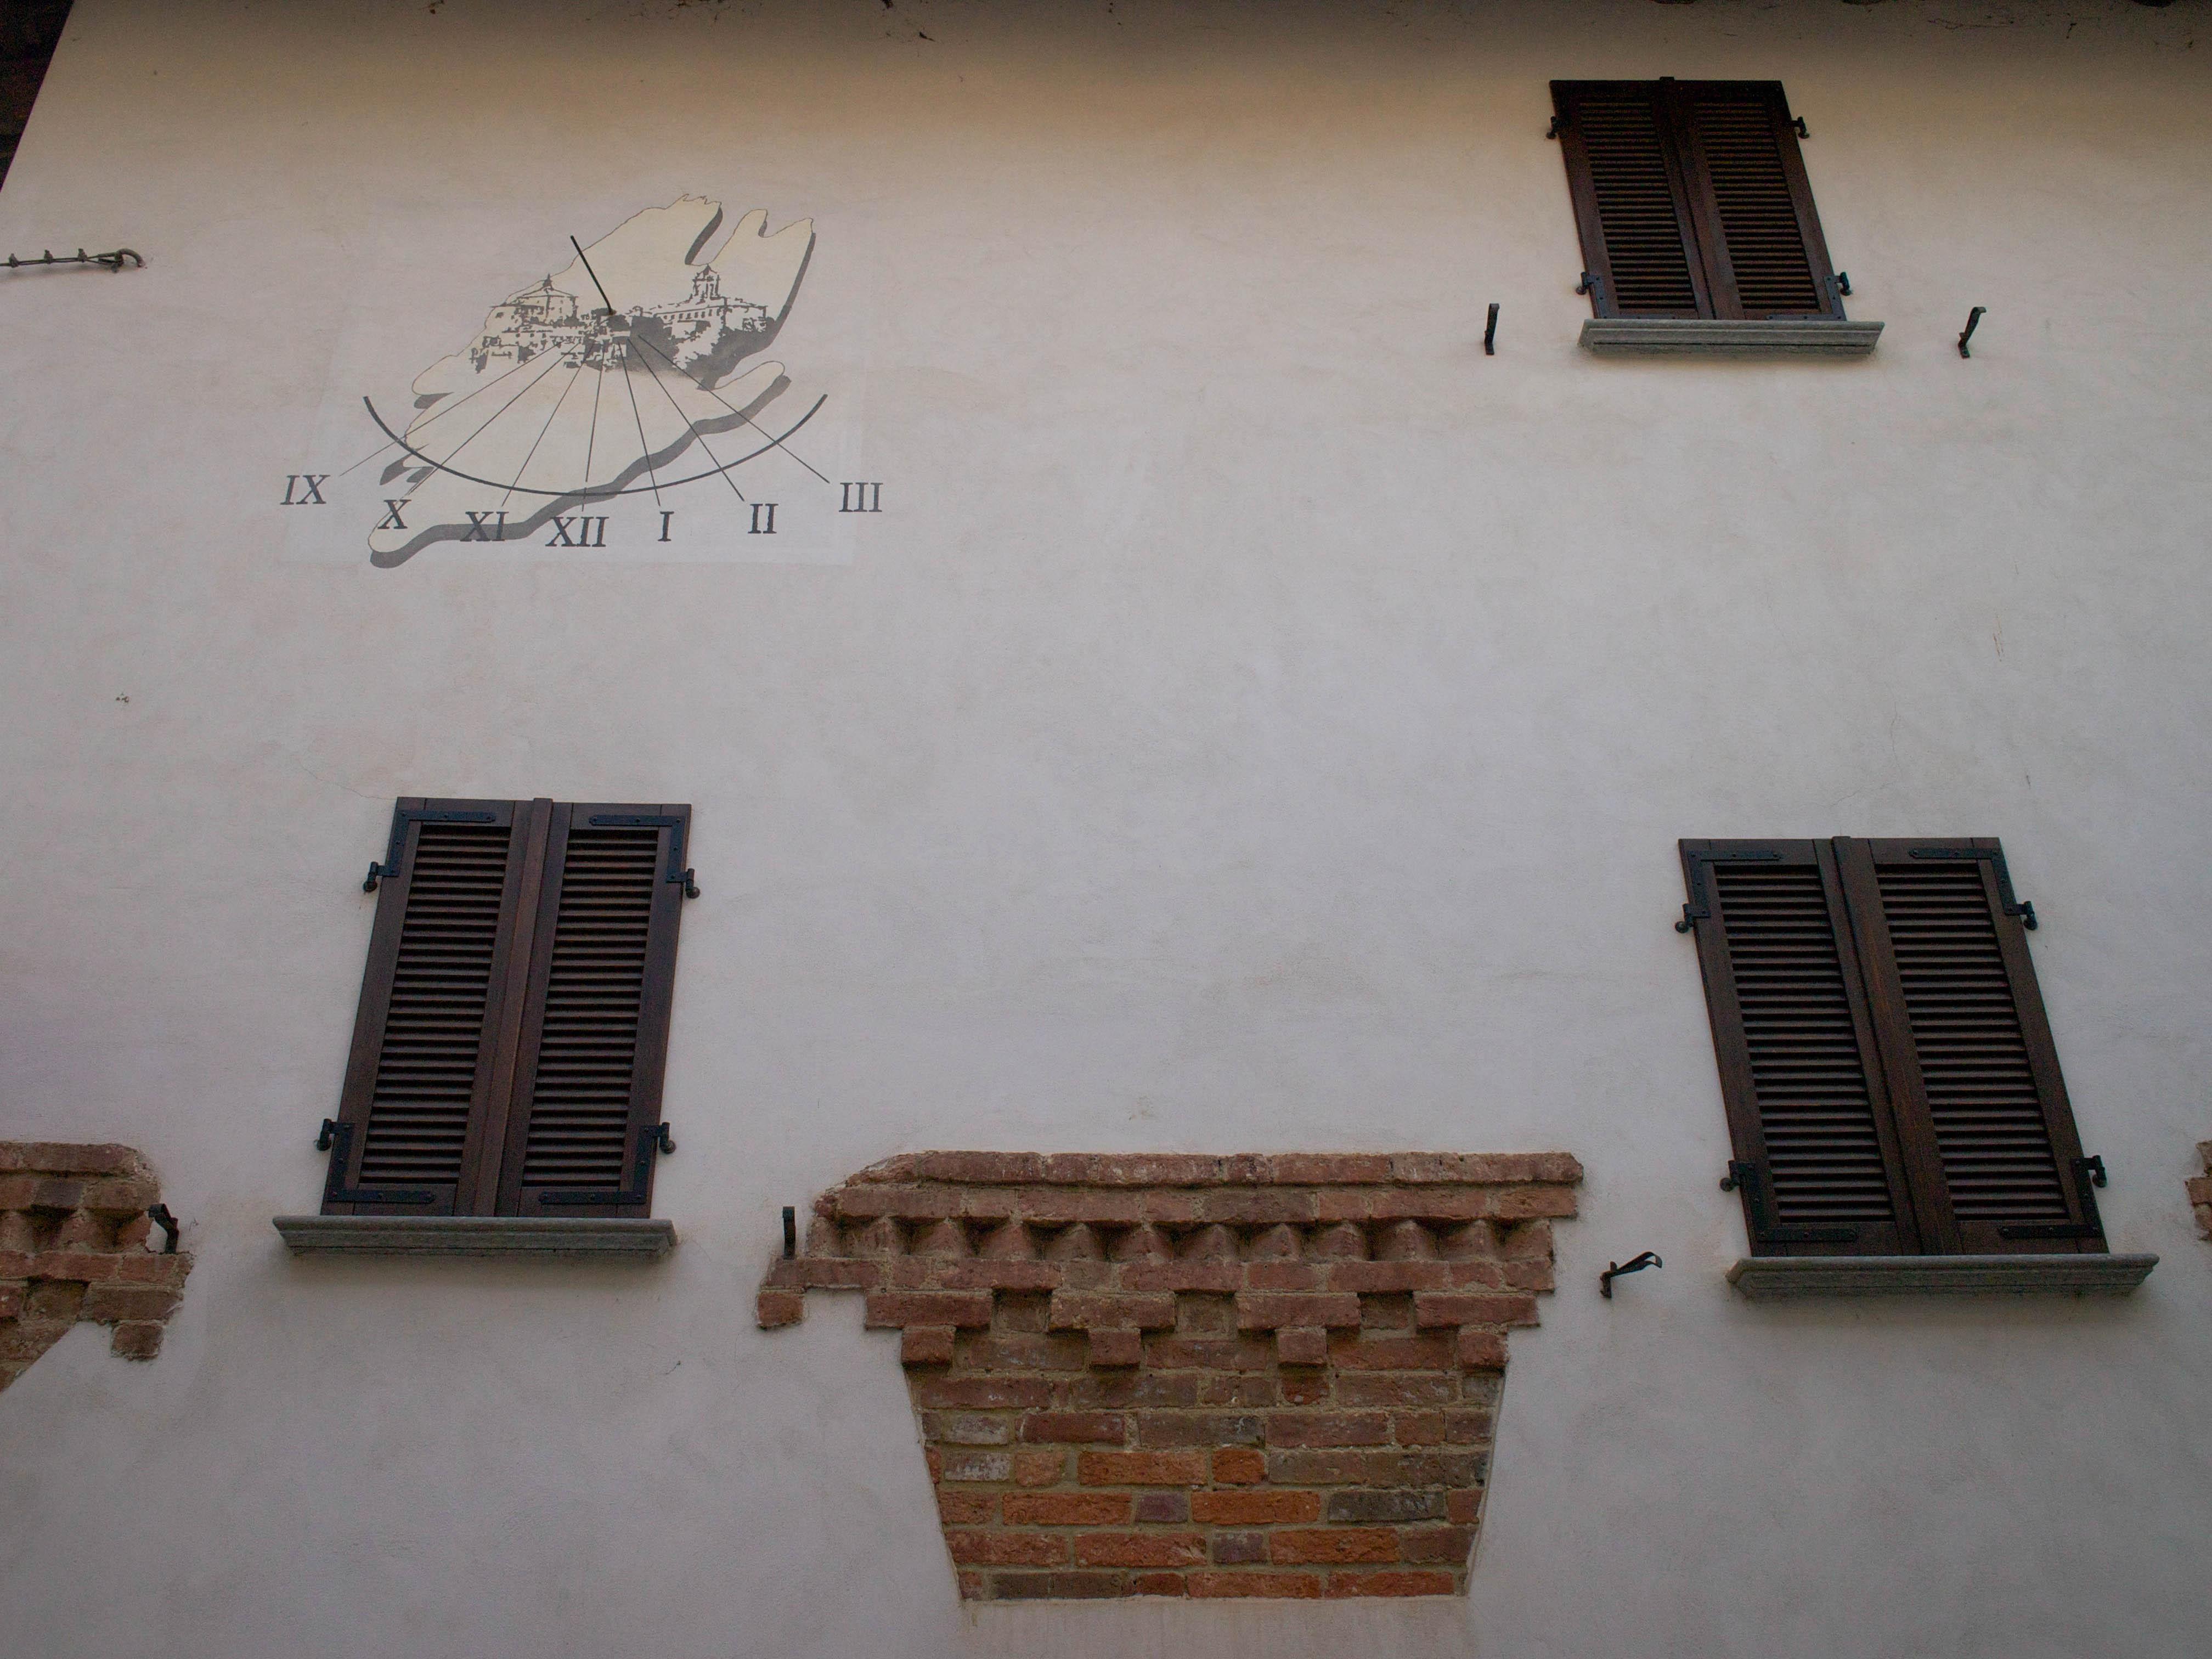 1 Via Monsignor Grasso, La Morra, Italy, 2014